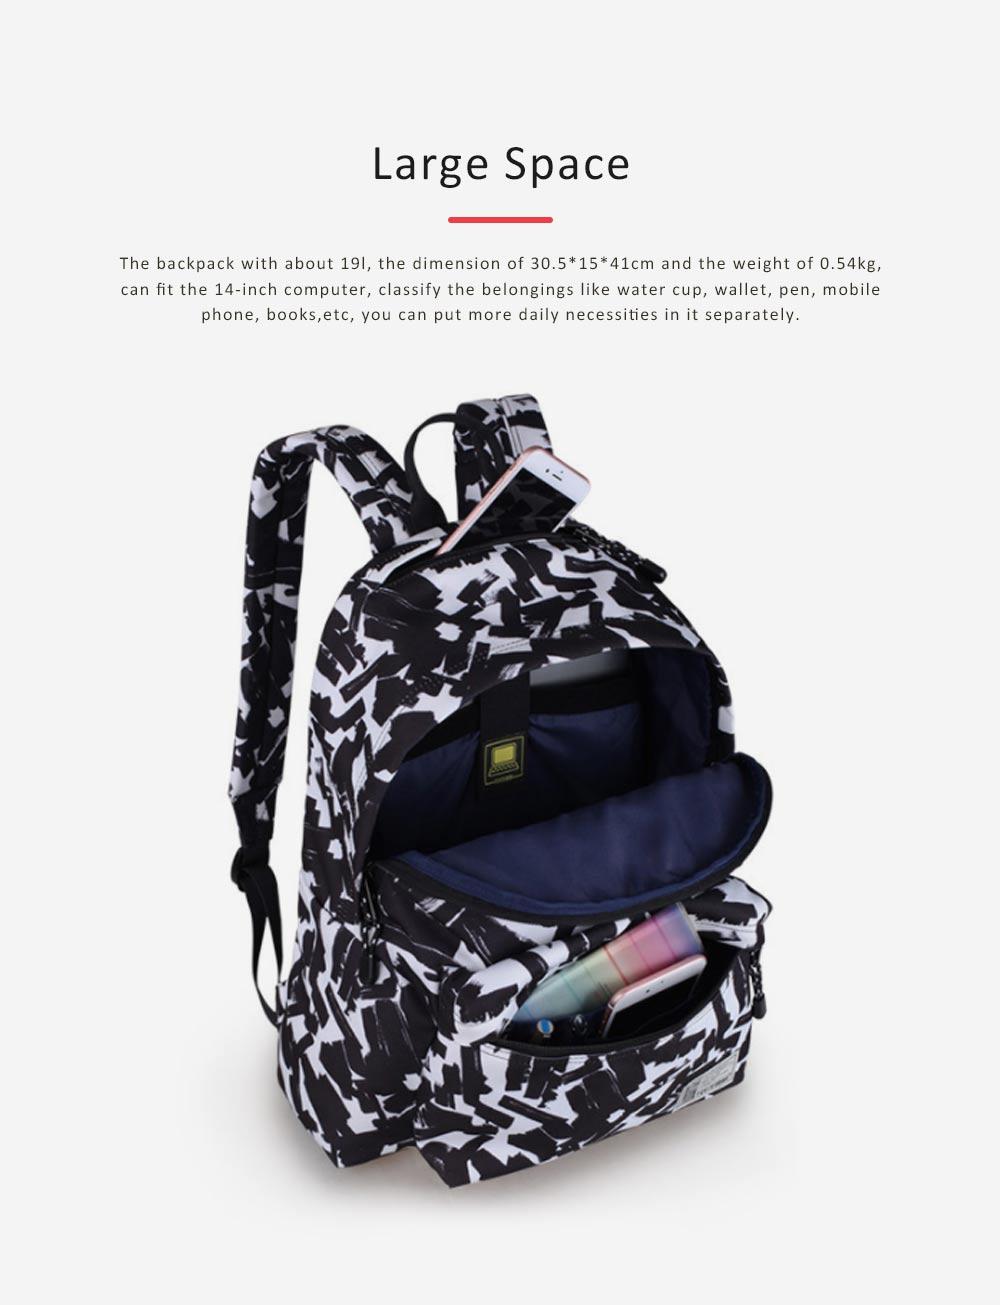 Unisex Black-white Backpack for Travel, Fashionable School Backpack for 14 inch Laptop 2